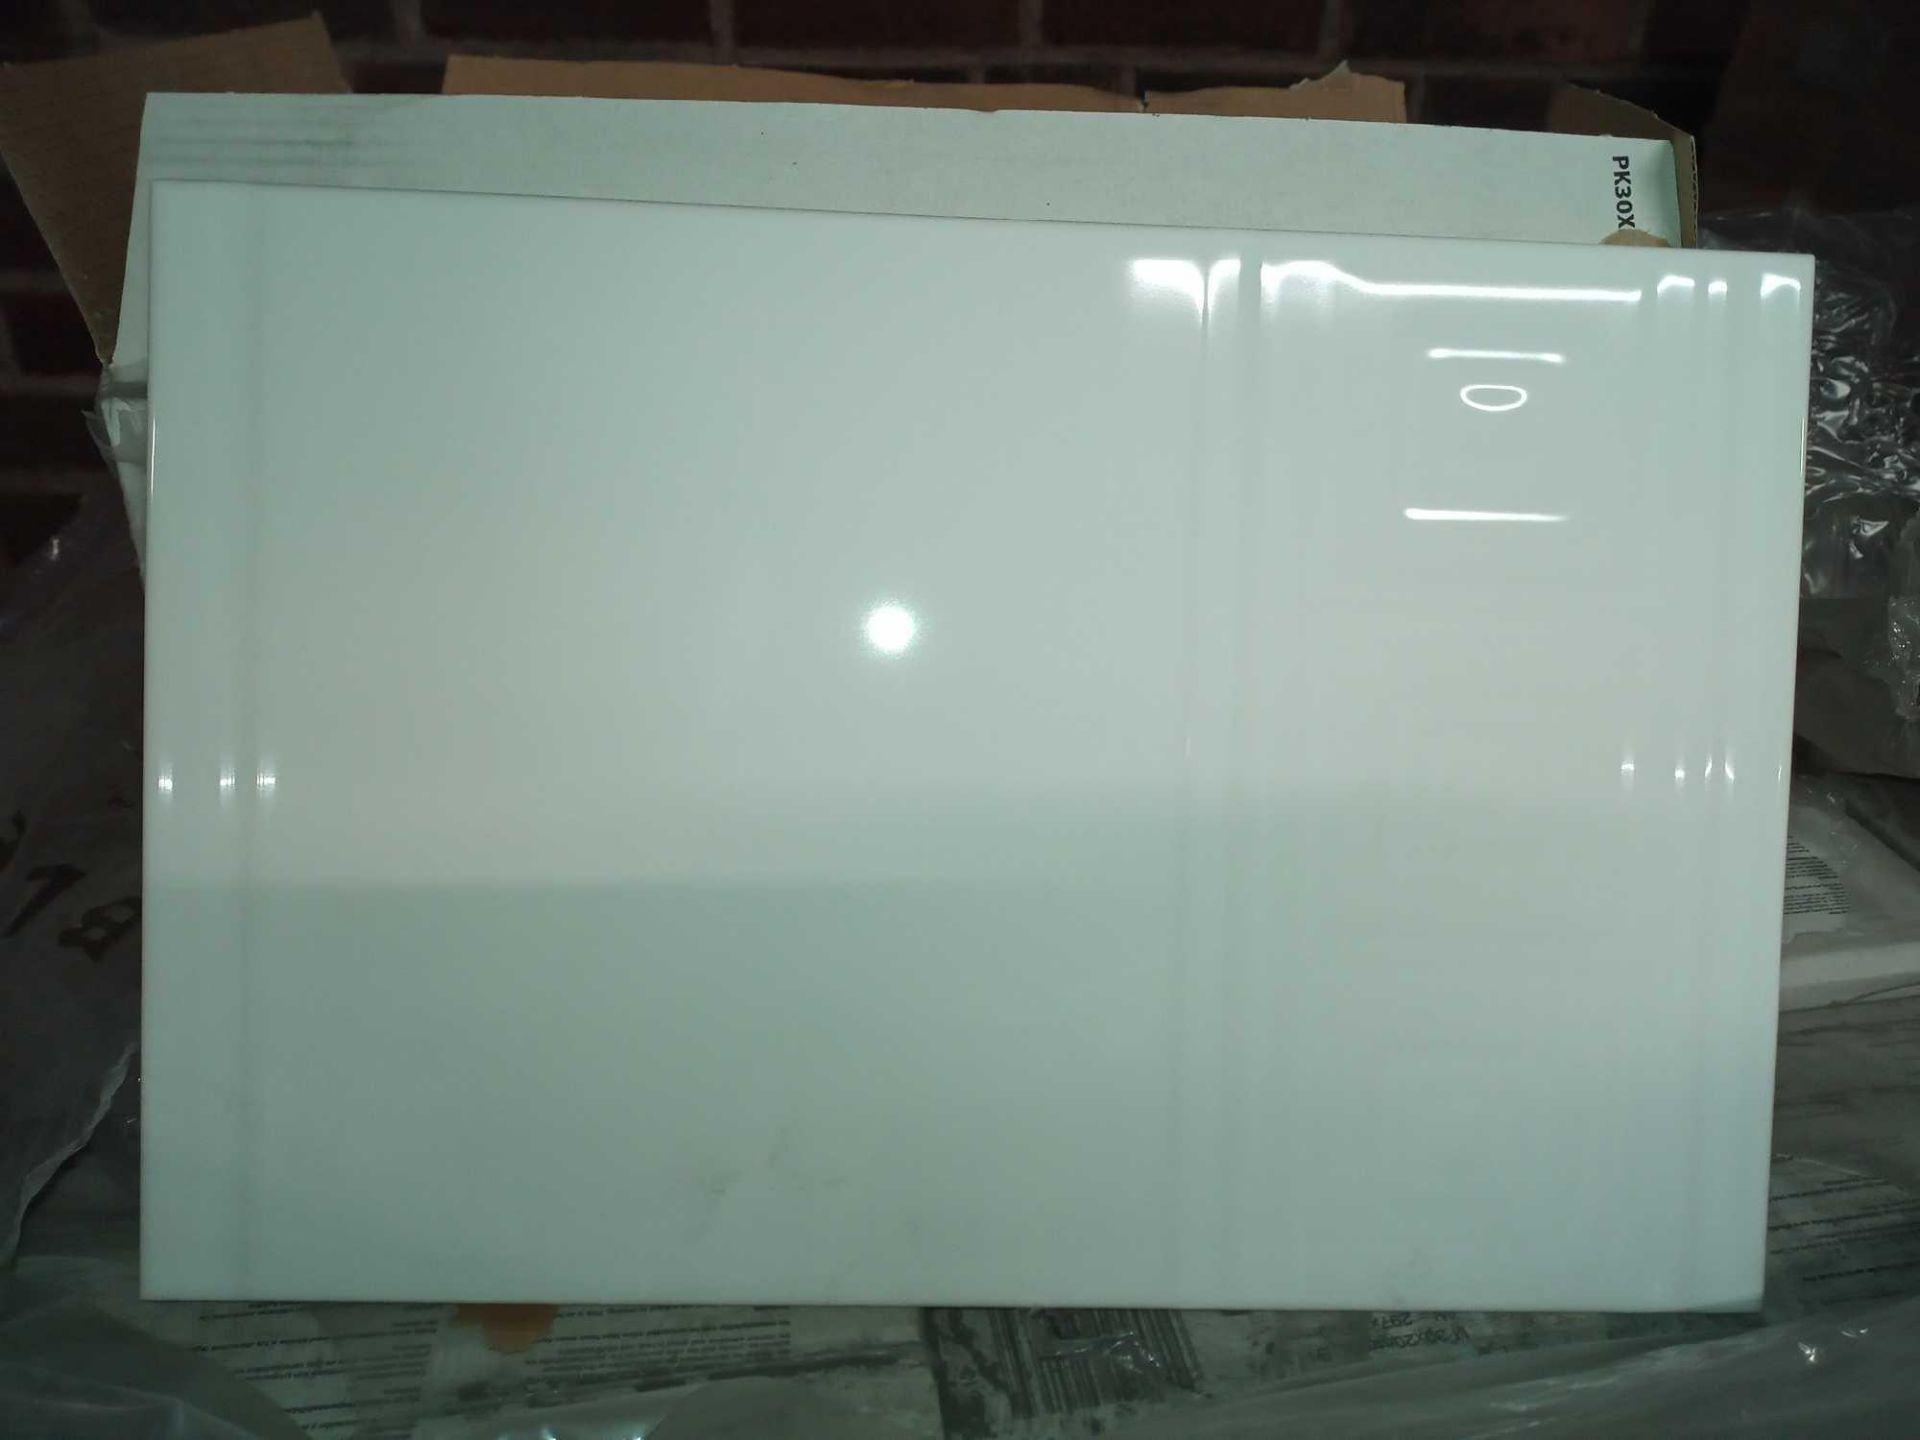 RRP £490 Pallet To Contain 49 Brand New Packs Of 17 Johnson's Almr1B Almeria White Border Tiles (